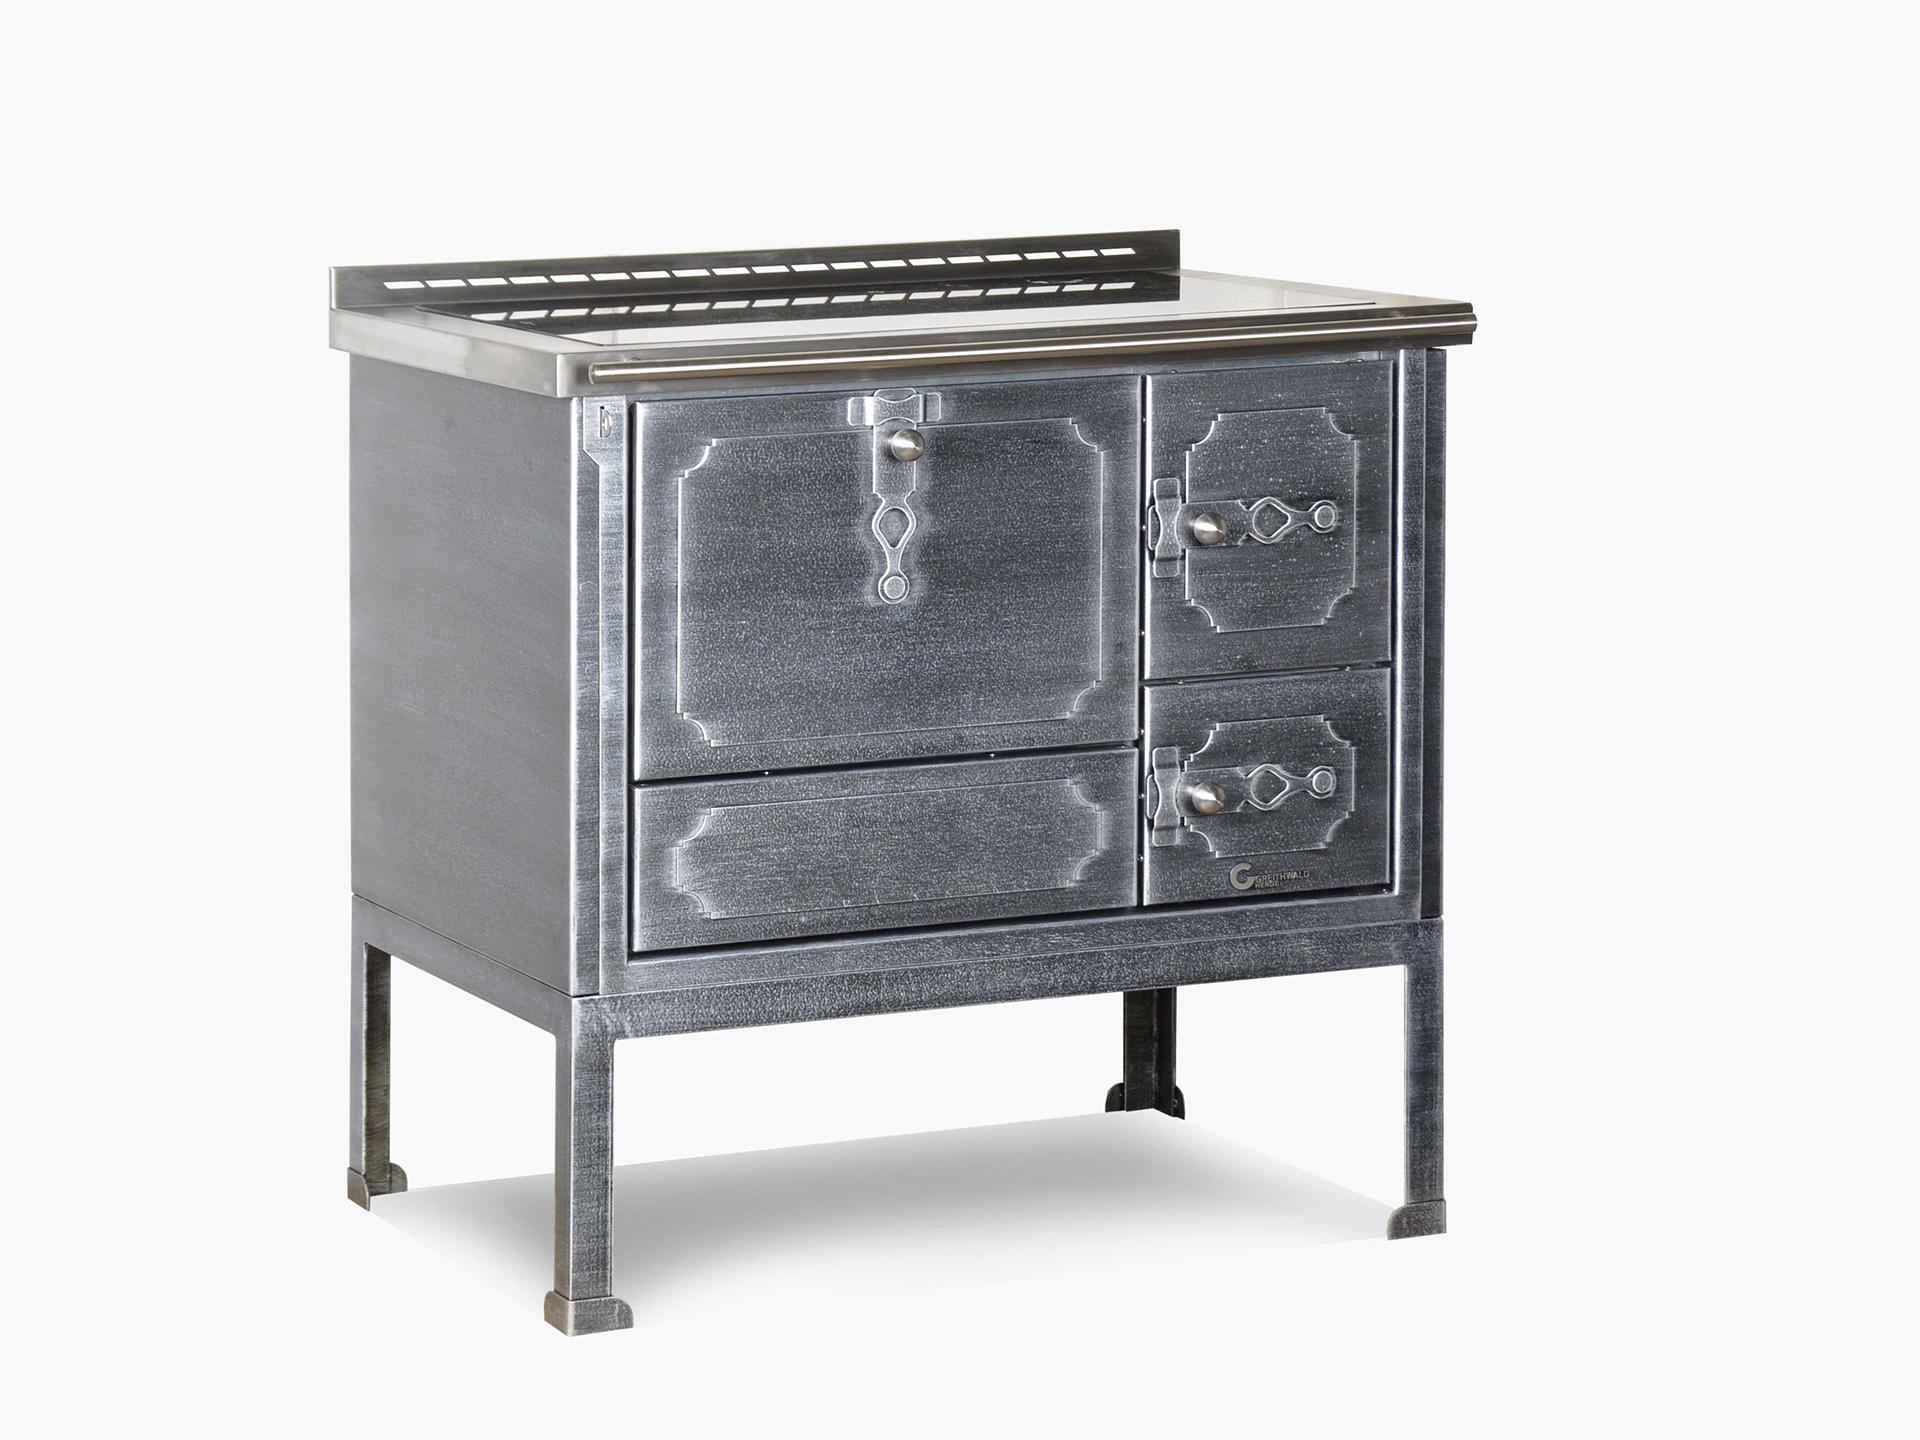 Kochmaschine, Herd, rustikline 90 dec10 argento piccola